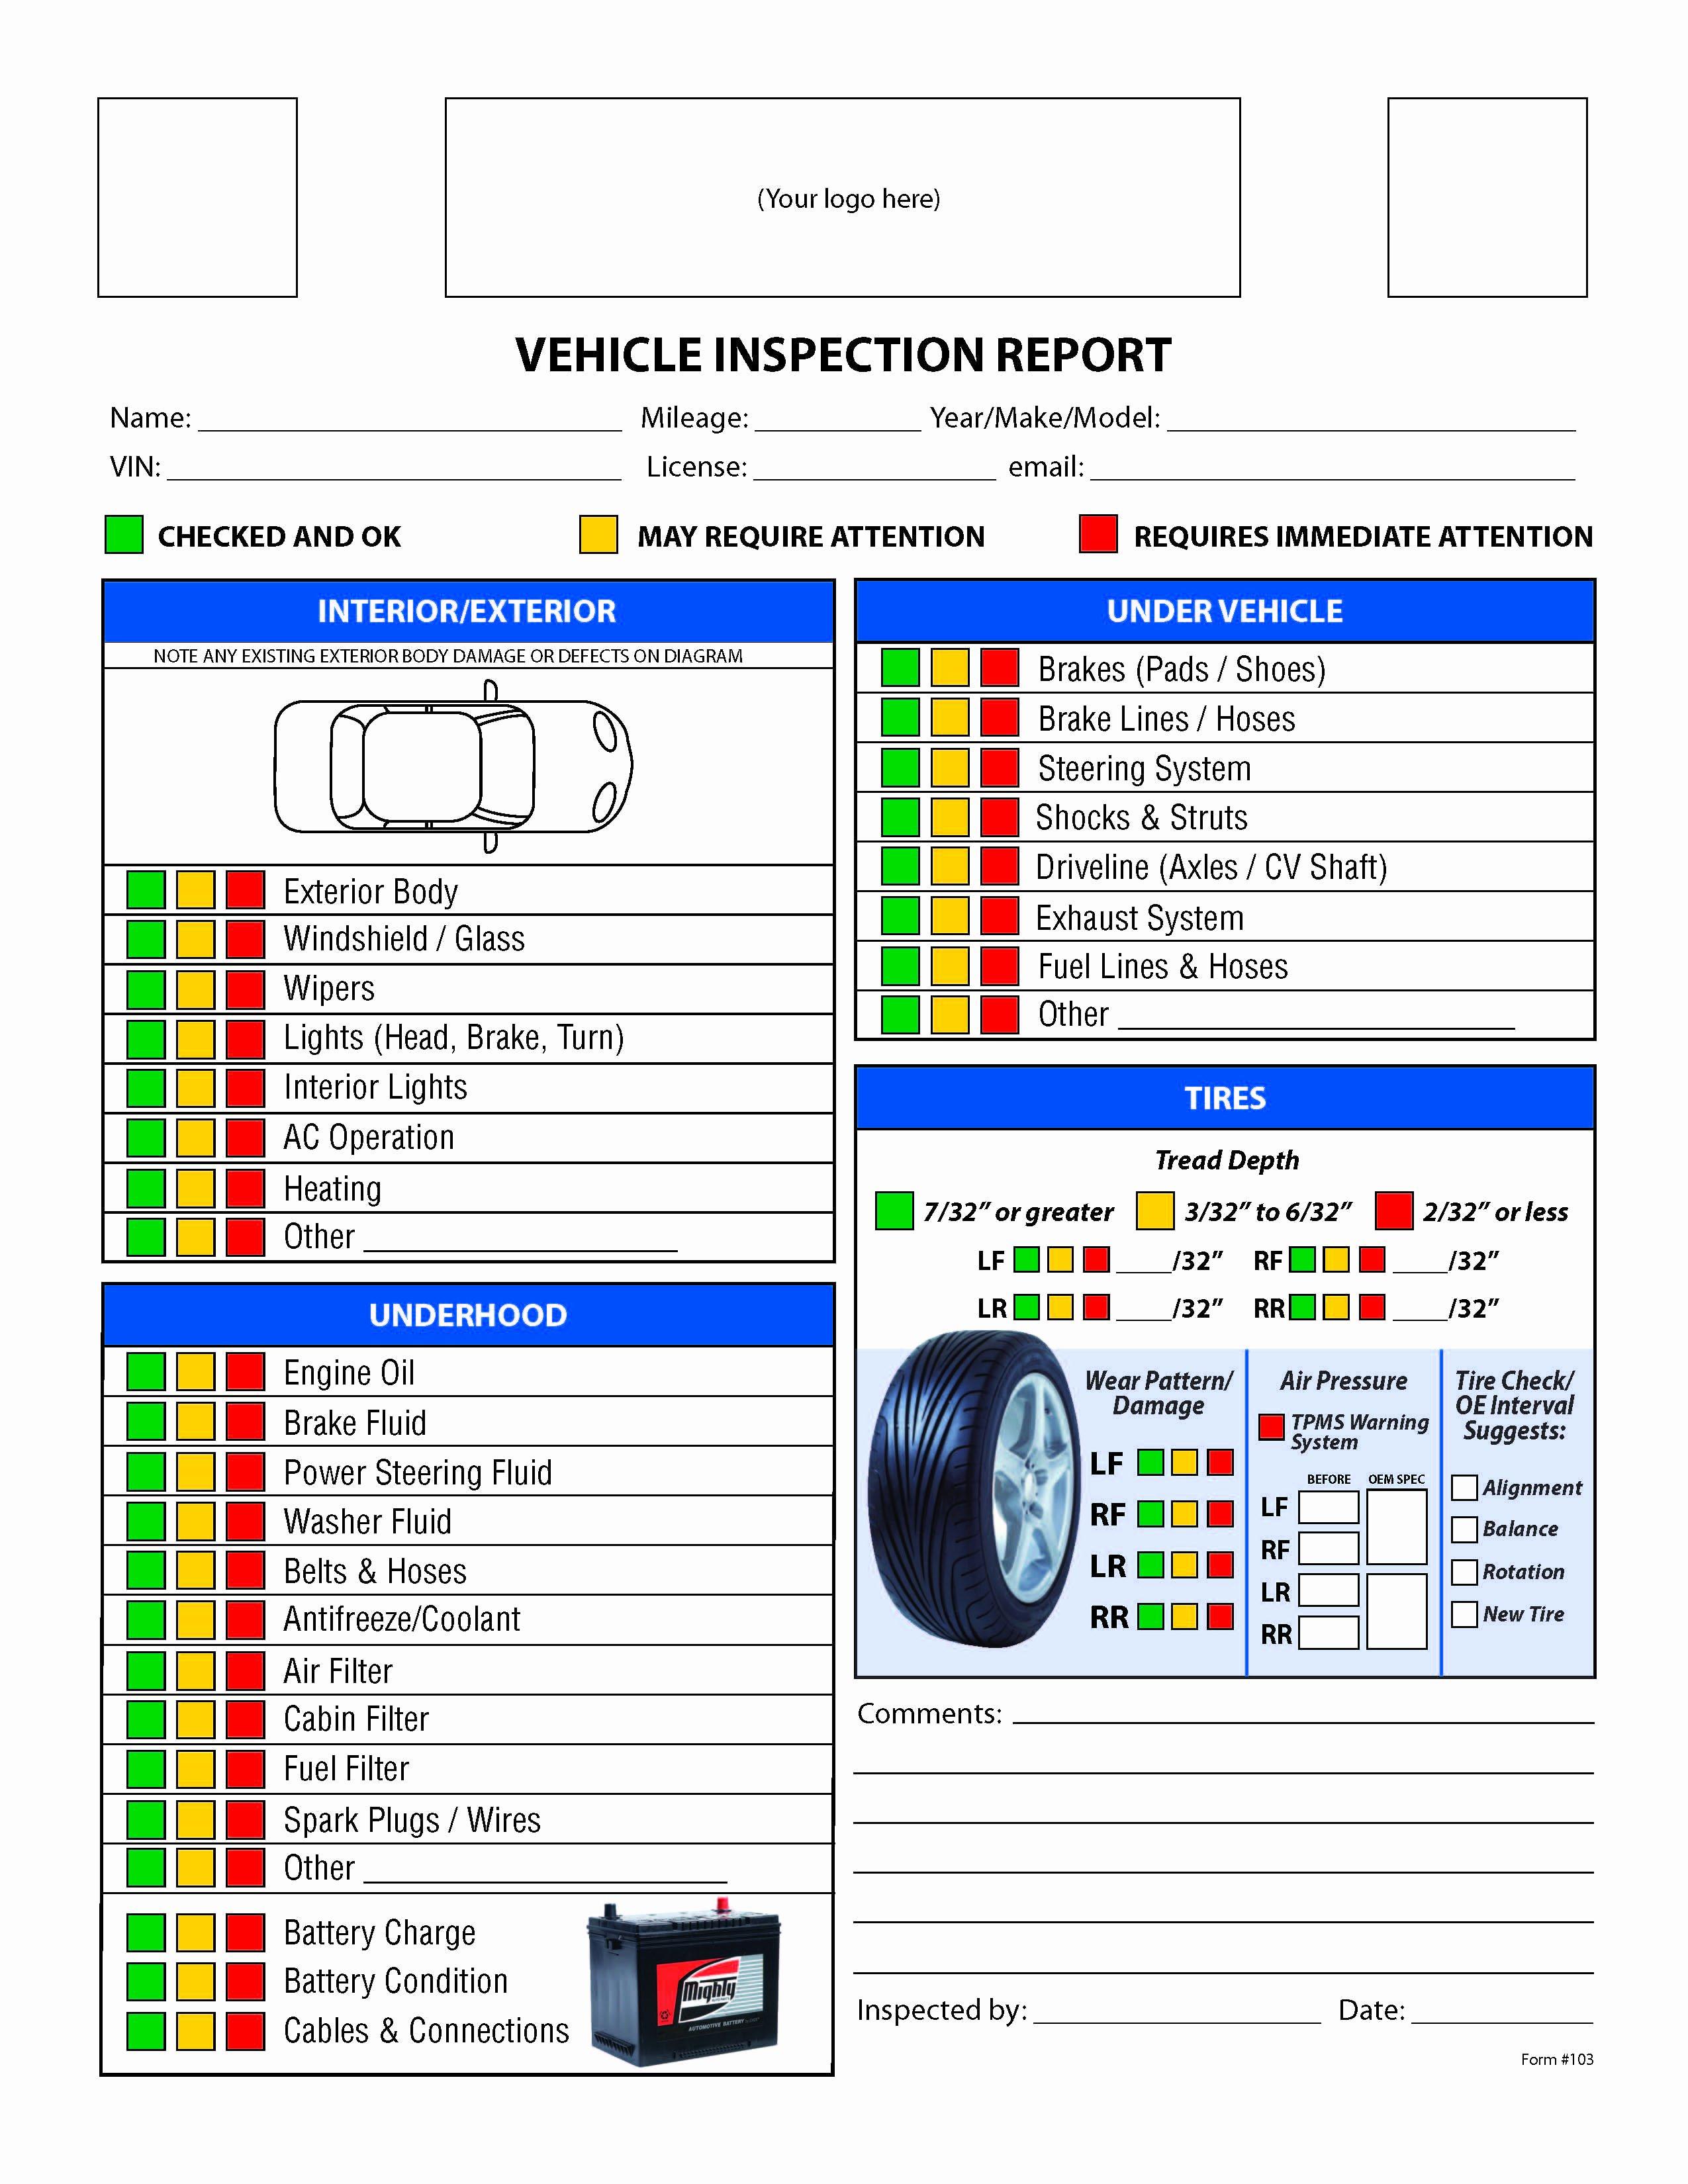 Vehicle Inspection Checklist Template Elegant Free Vehicle Inspection Checklist form